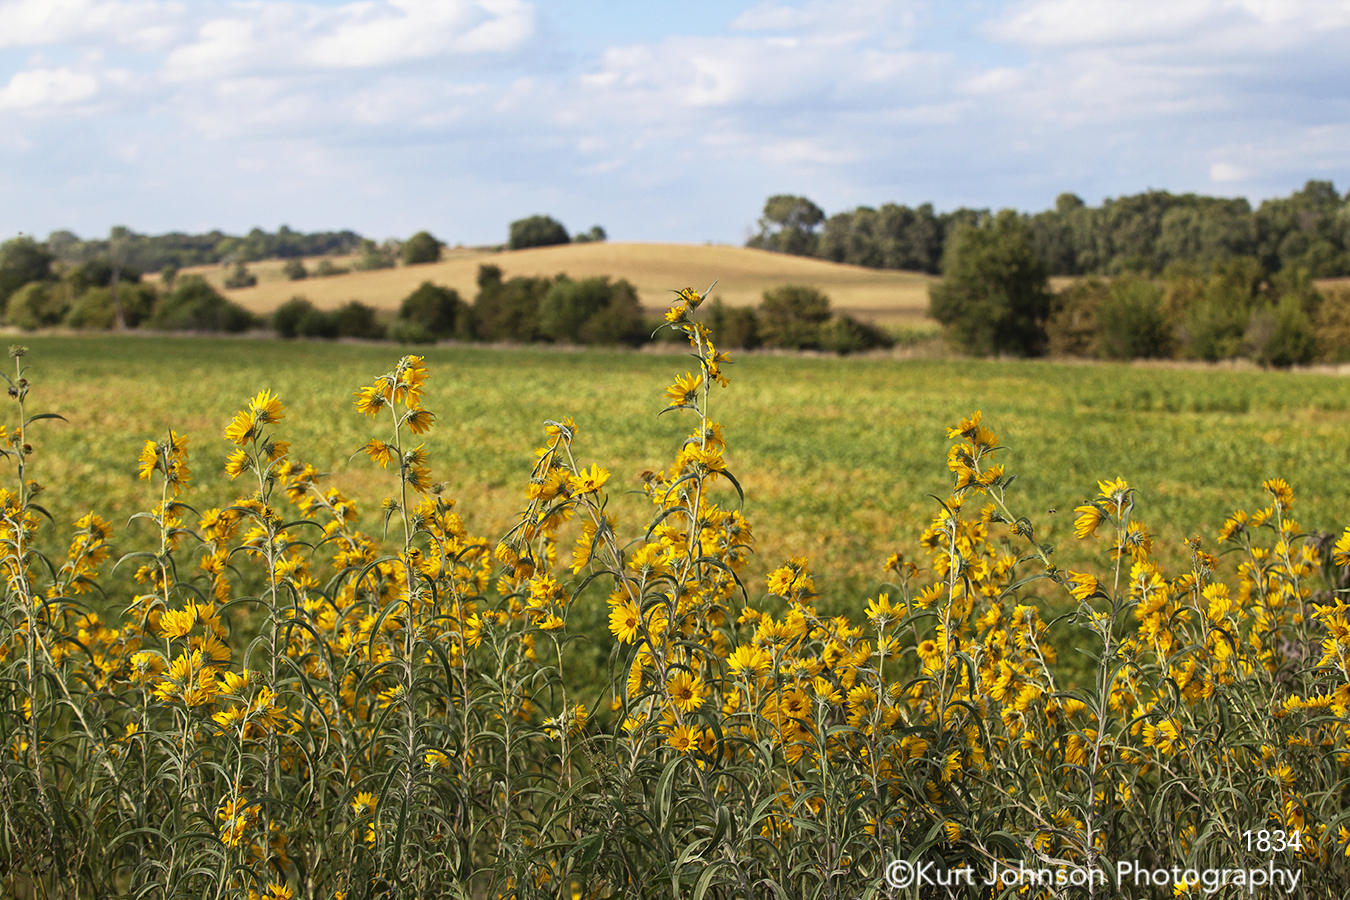 landscape flowers yellow field trees midwest